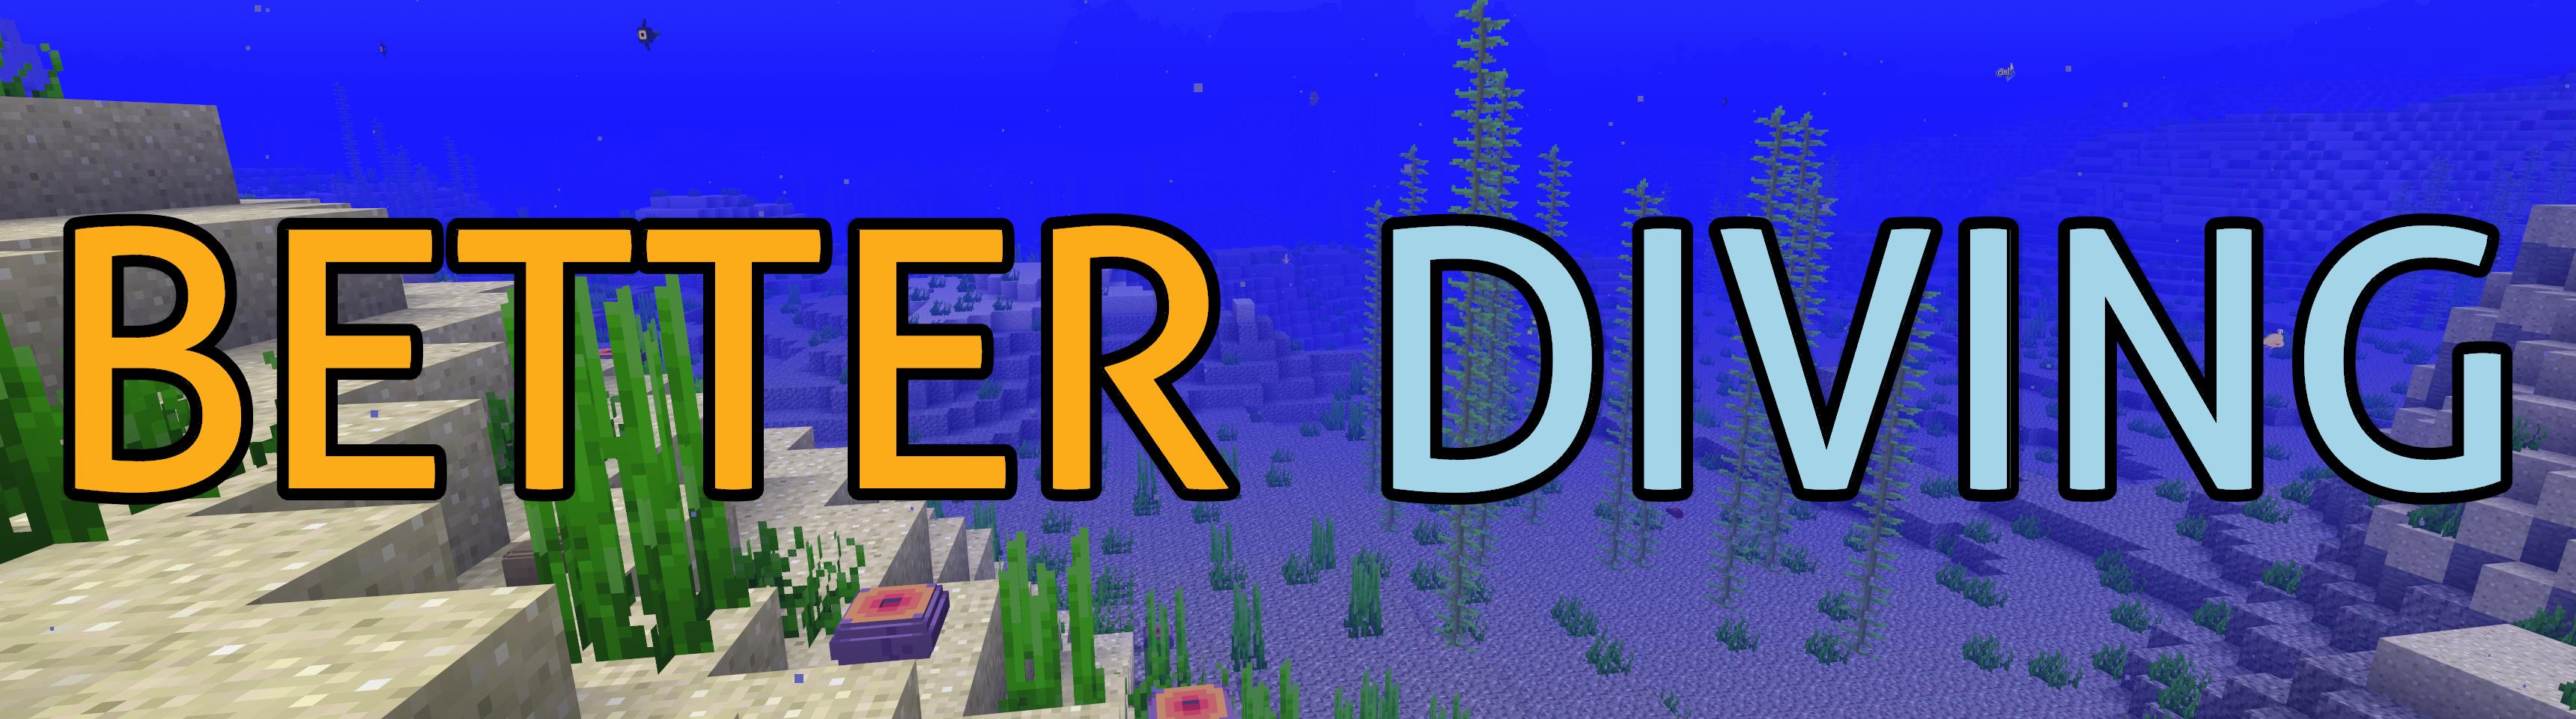 Better Diving - Mods - Minecraft - CurseForge